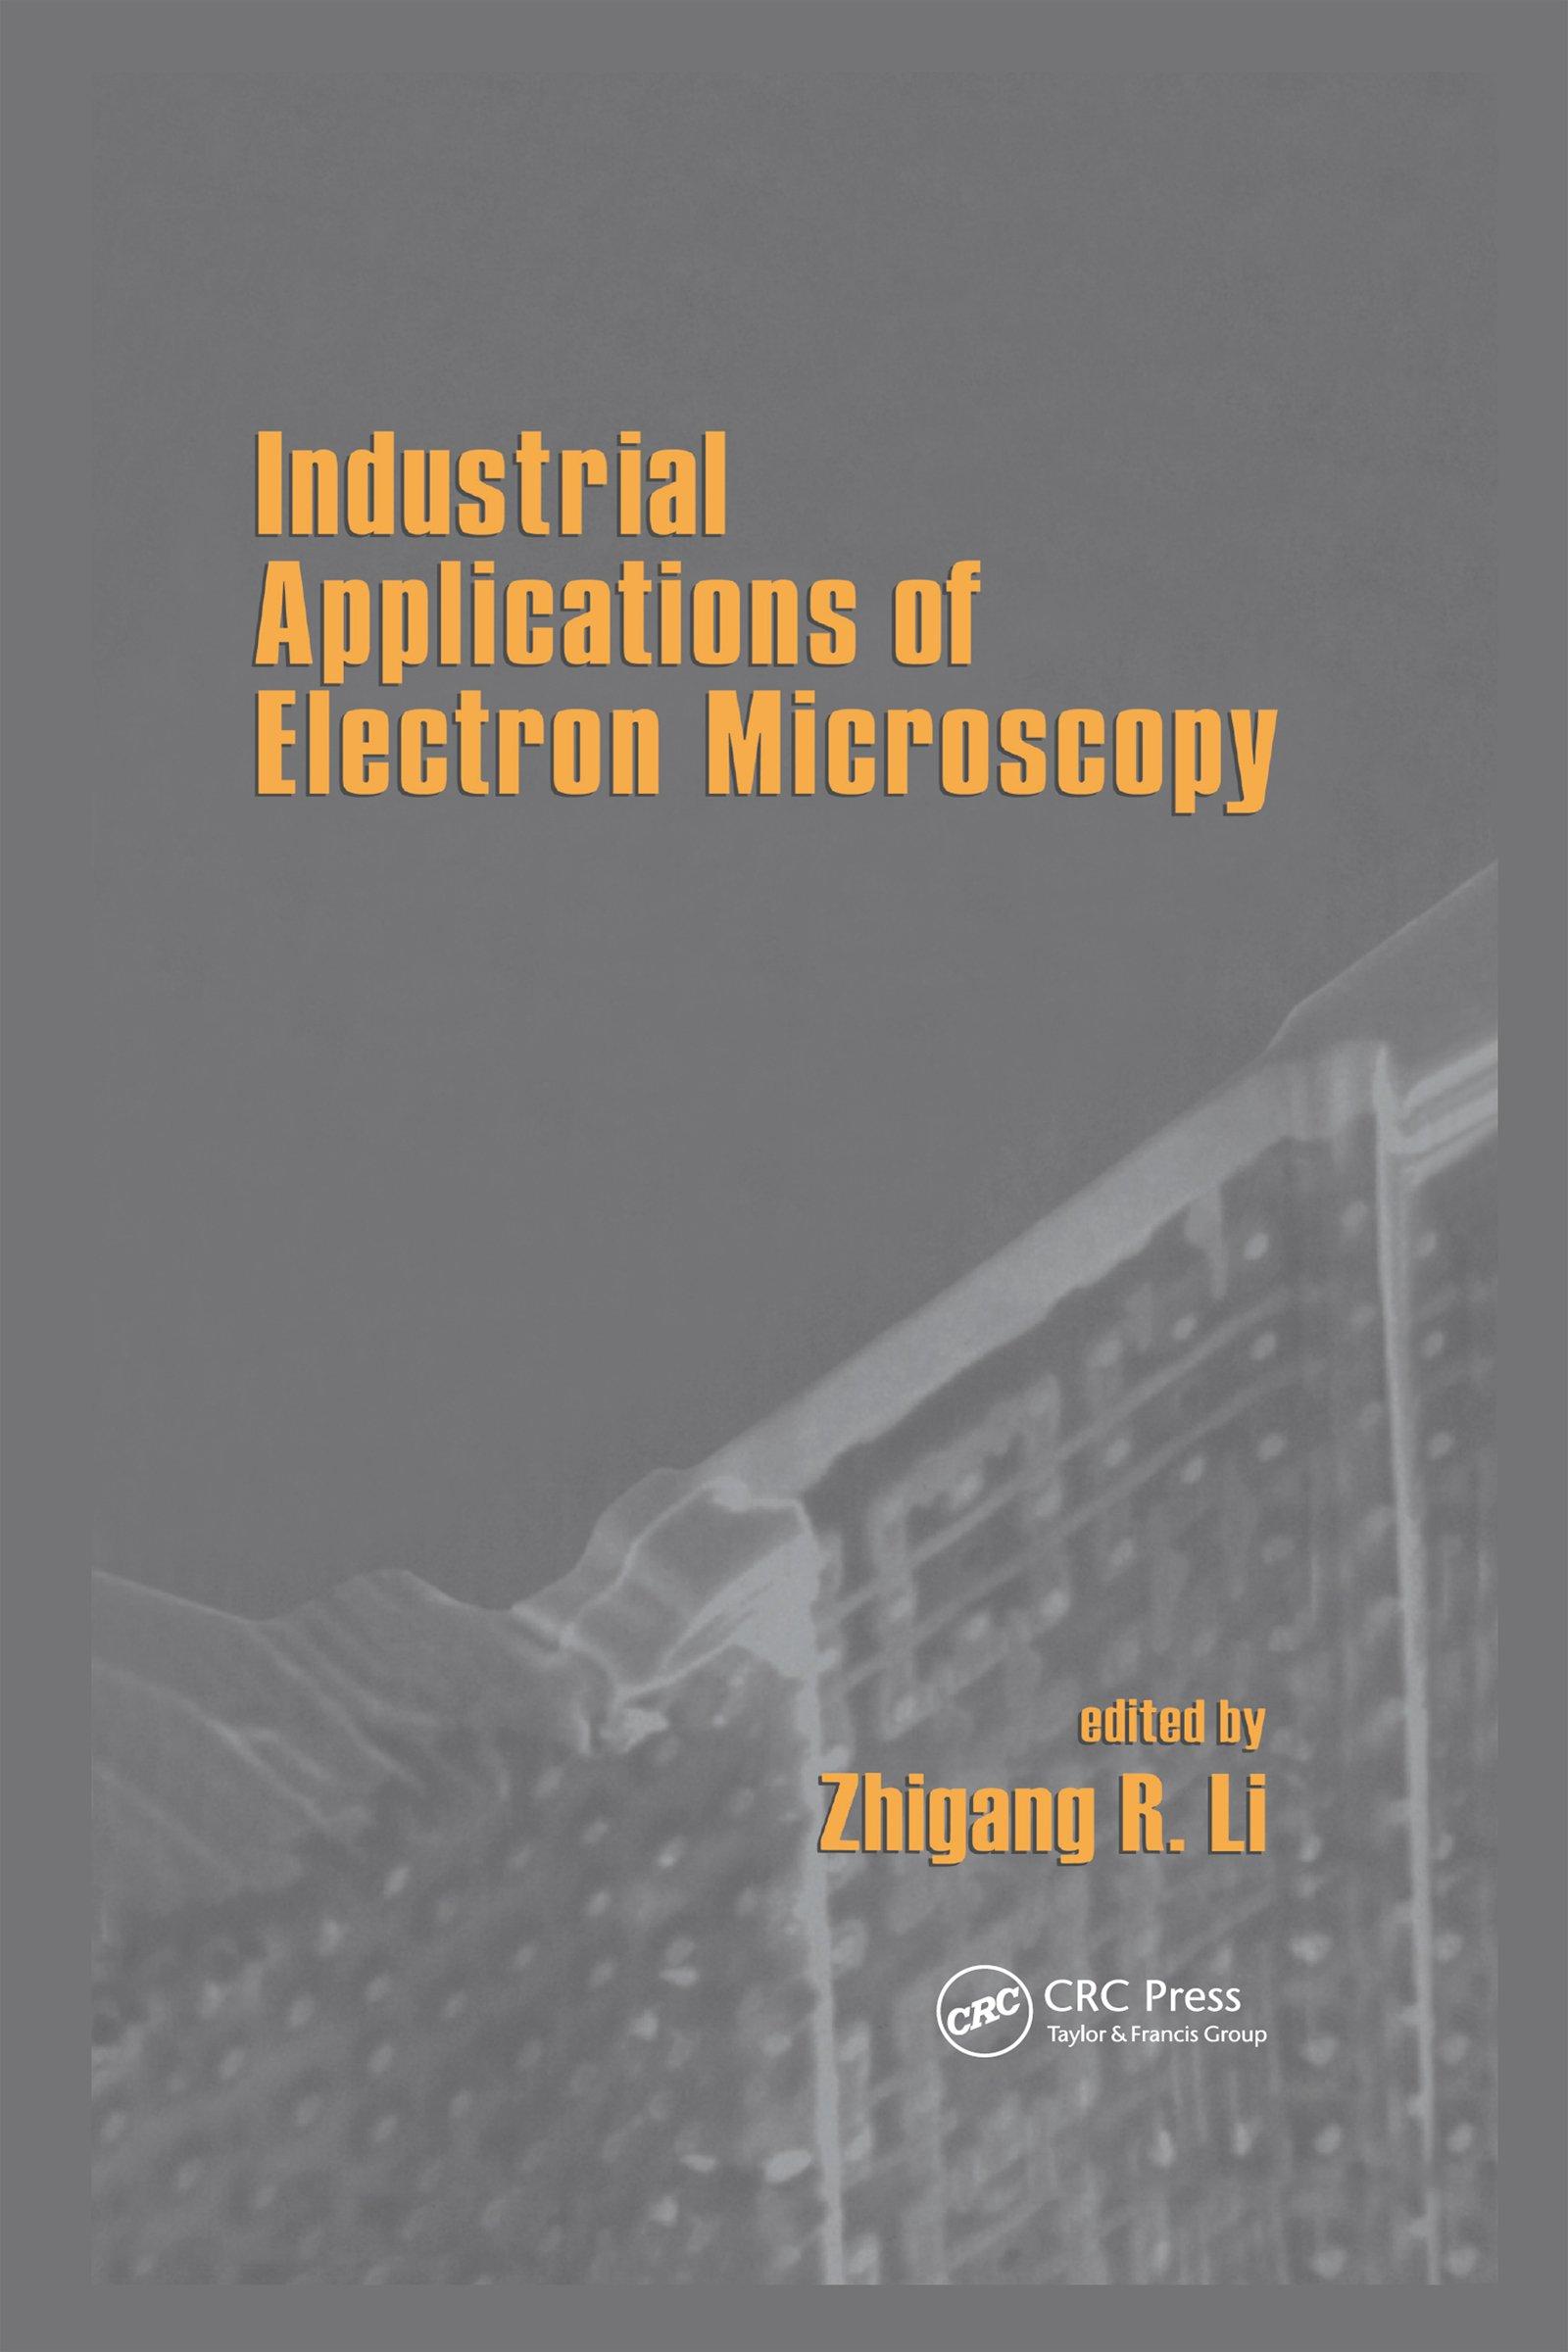 Digital Imaging in Electron Microscopy